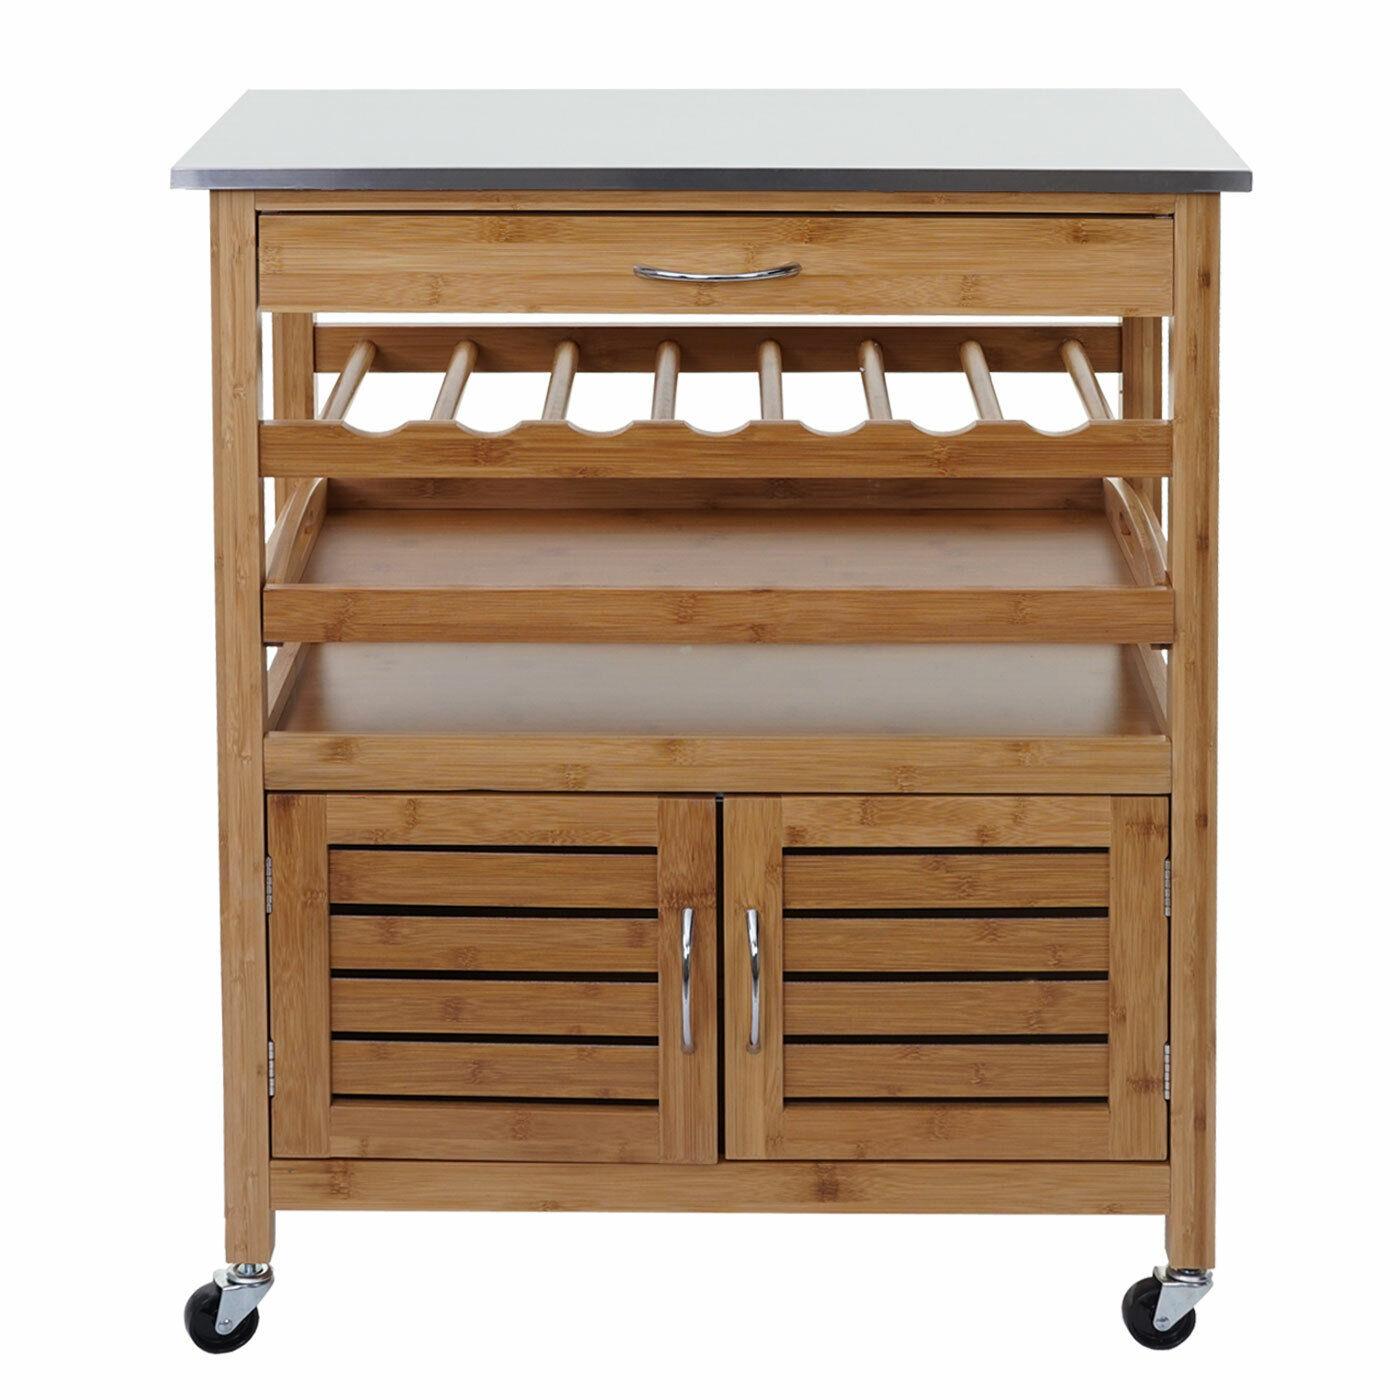 Trolley HWC-D15, Bamboo Stainless Steel Plate, Bar Kitchen Helper 89x70x37cm